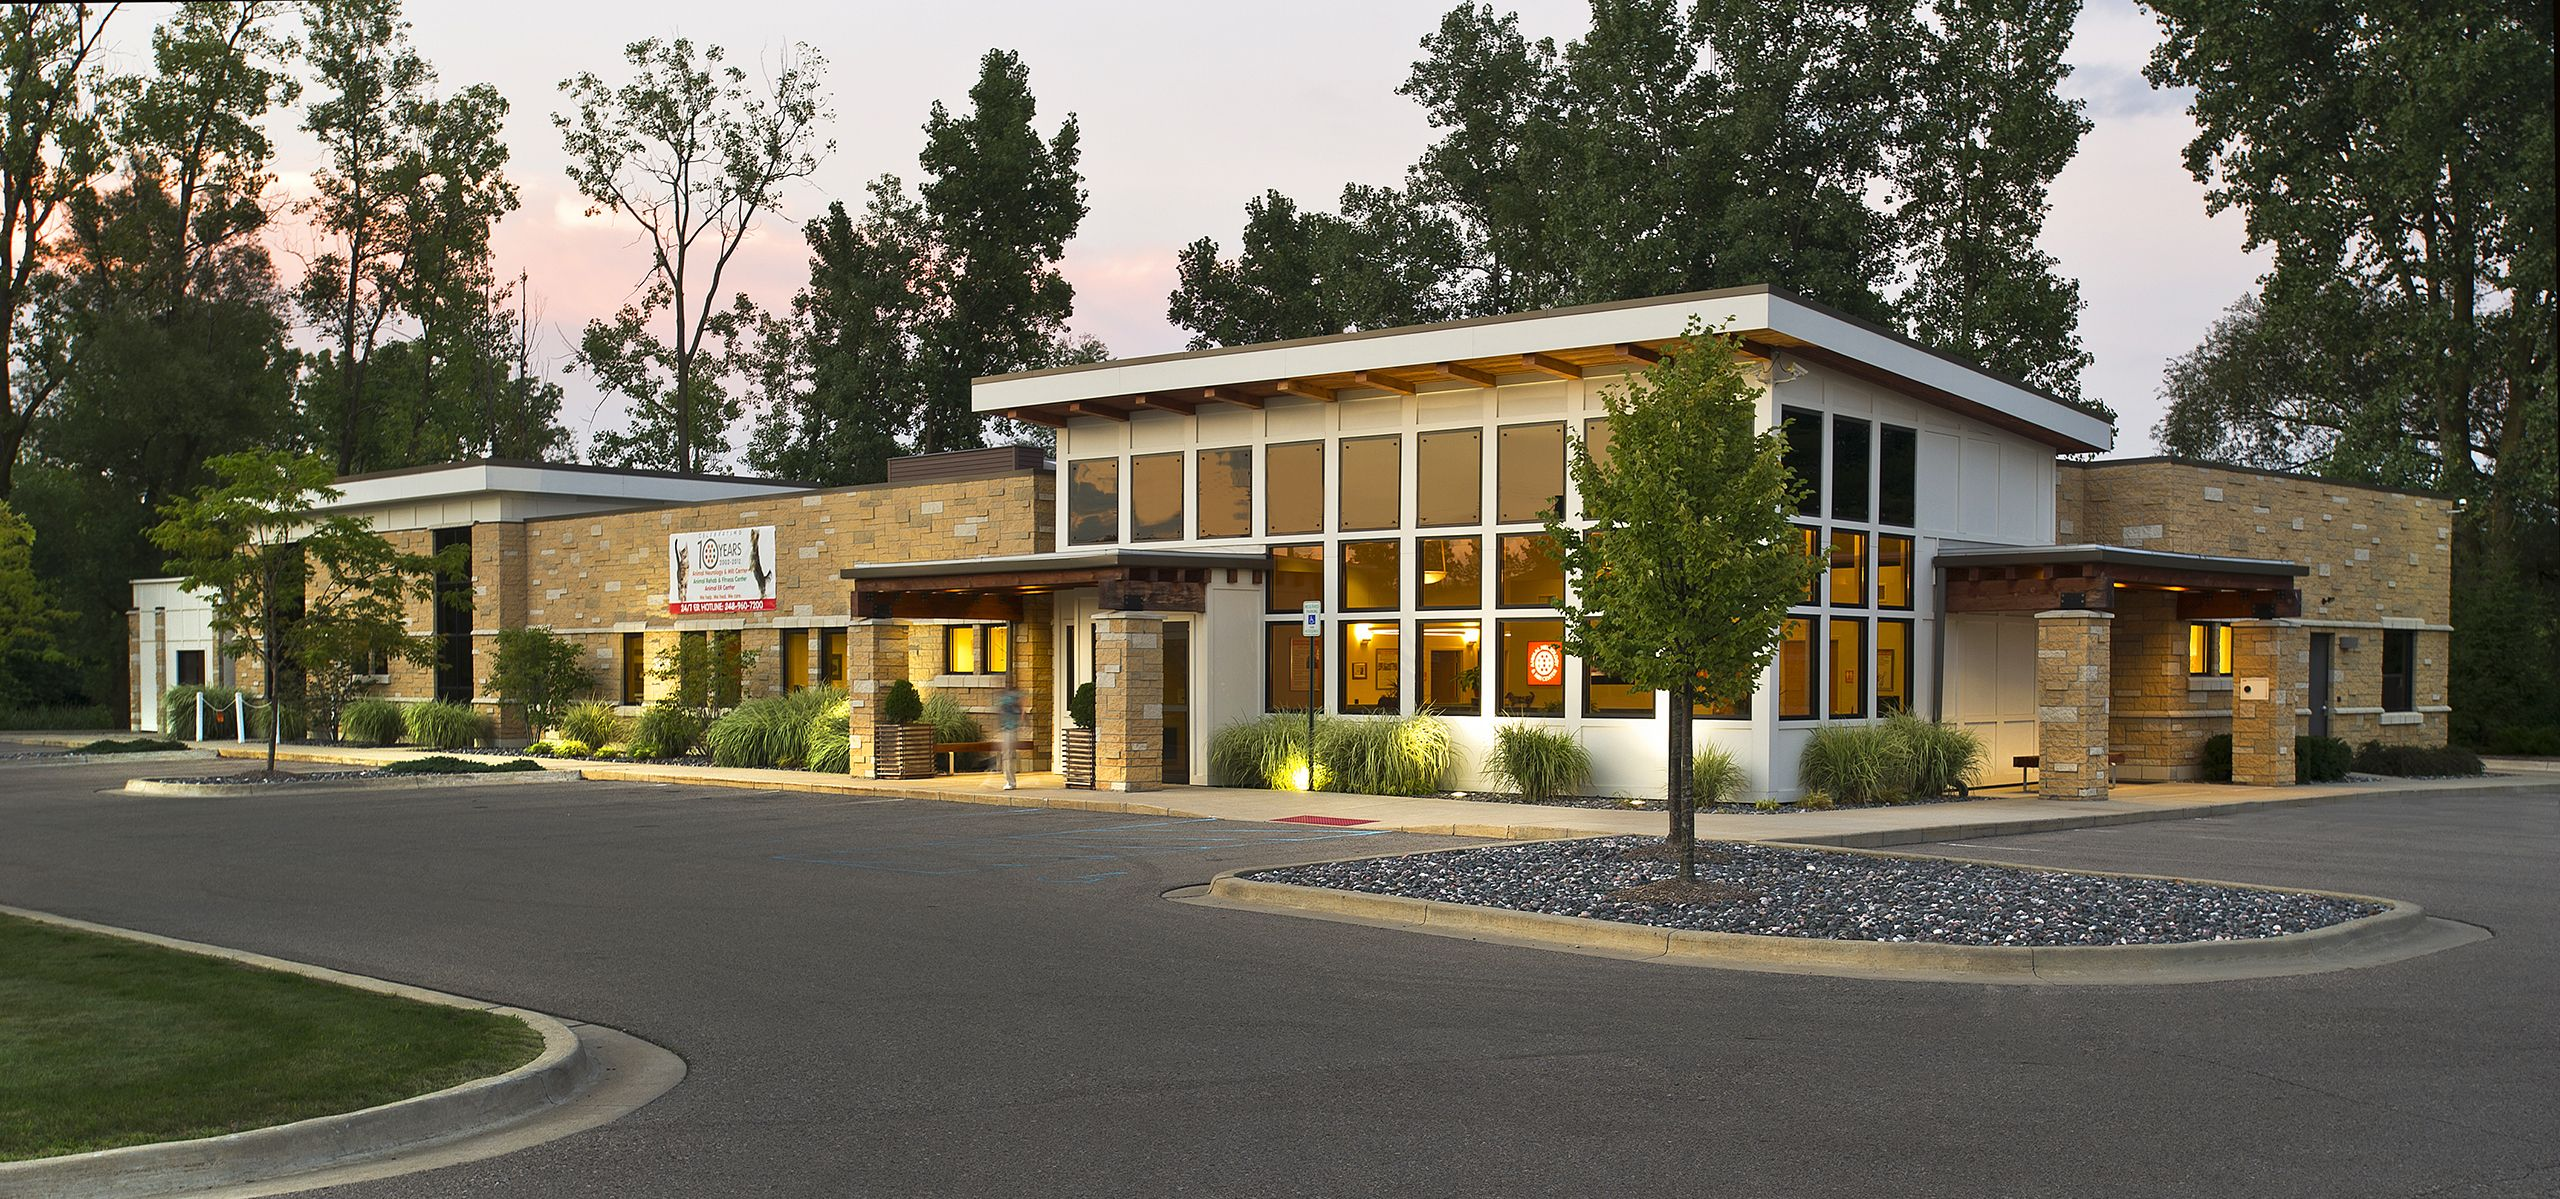 Vet Clinic Exterior